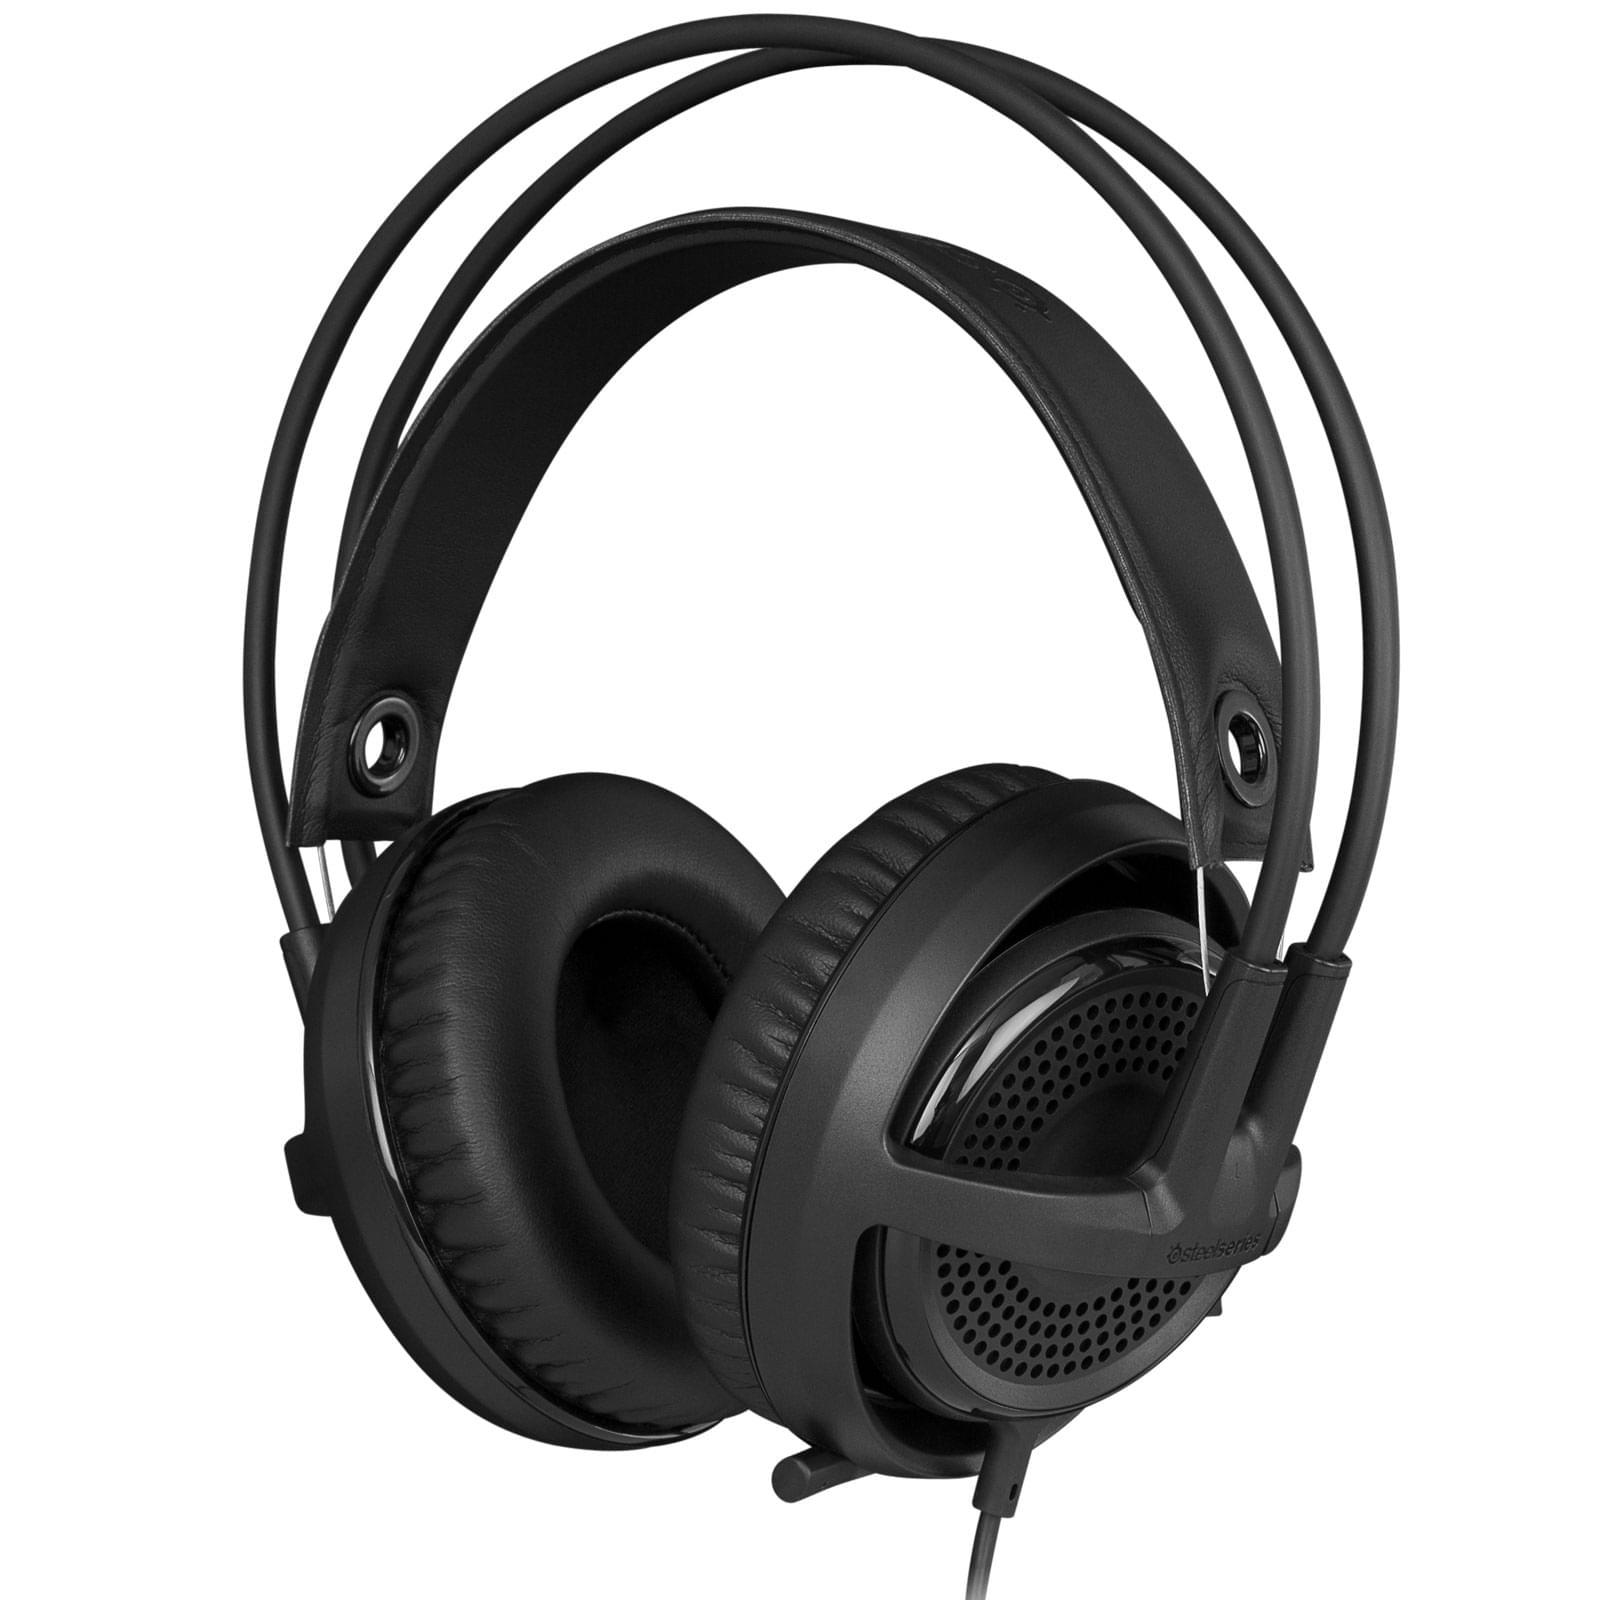 Steelseries Siberia V3 Noir (61357) - Achat / Vente Micro-casque sur Cybertek.fr - 0